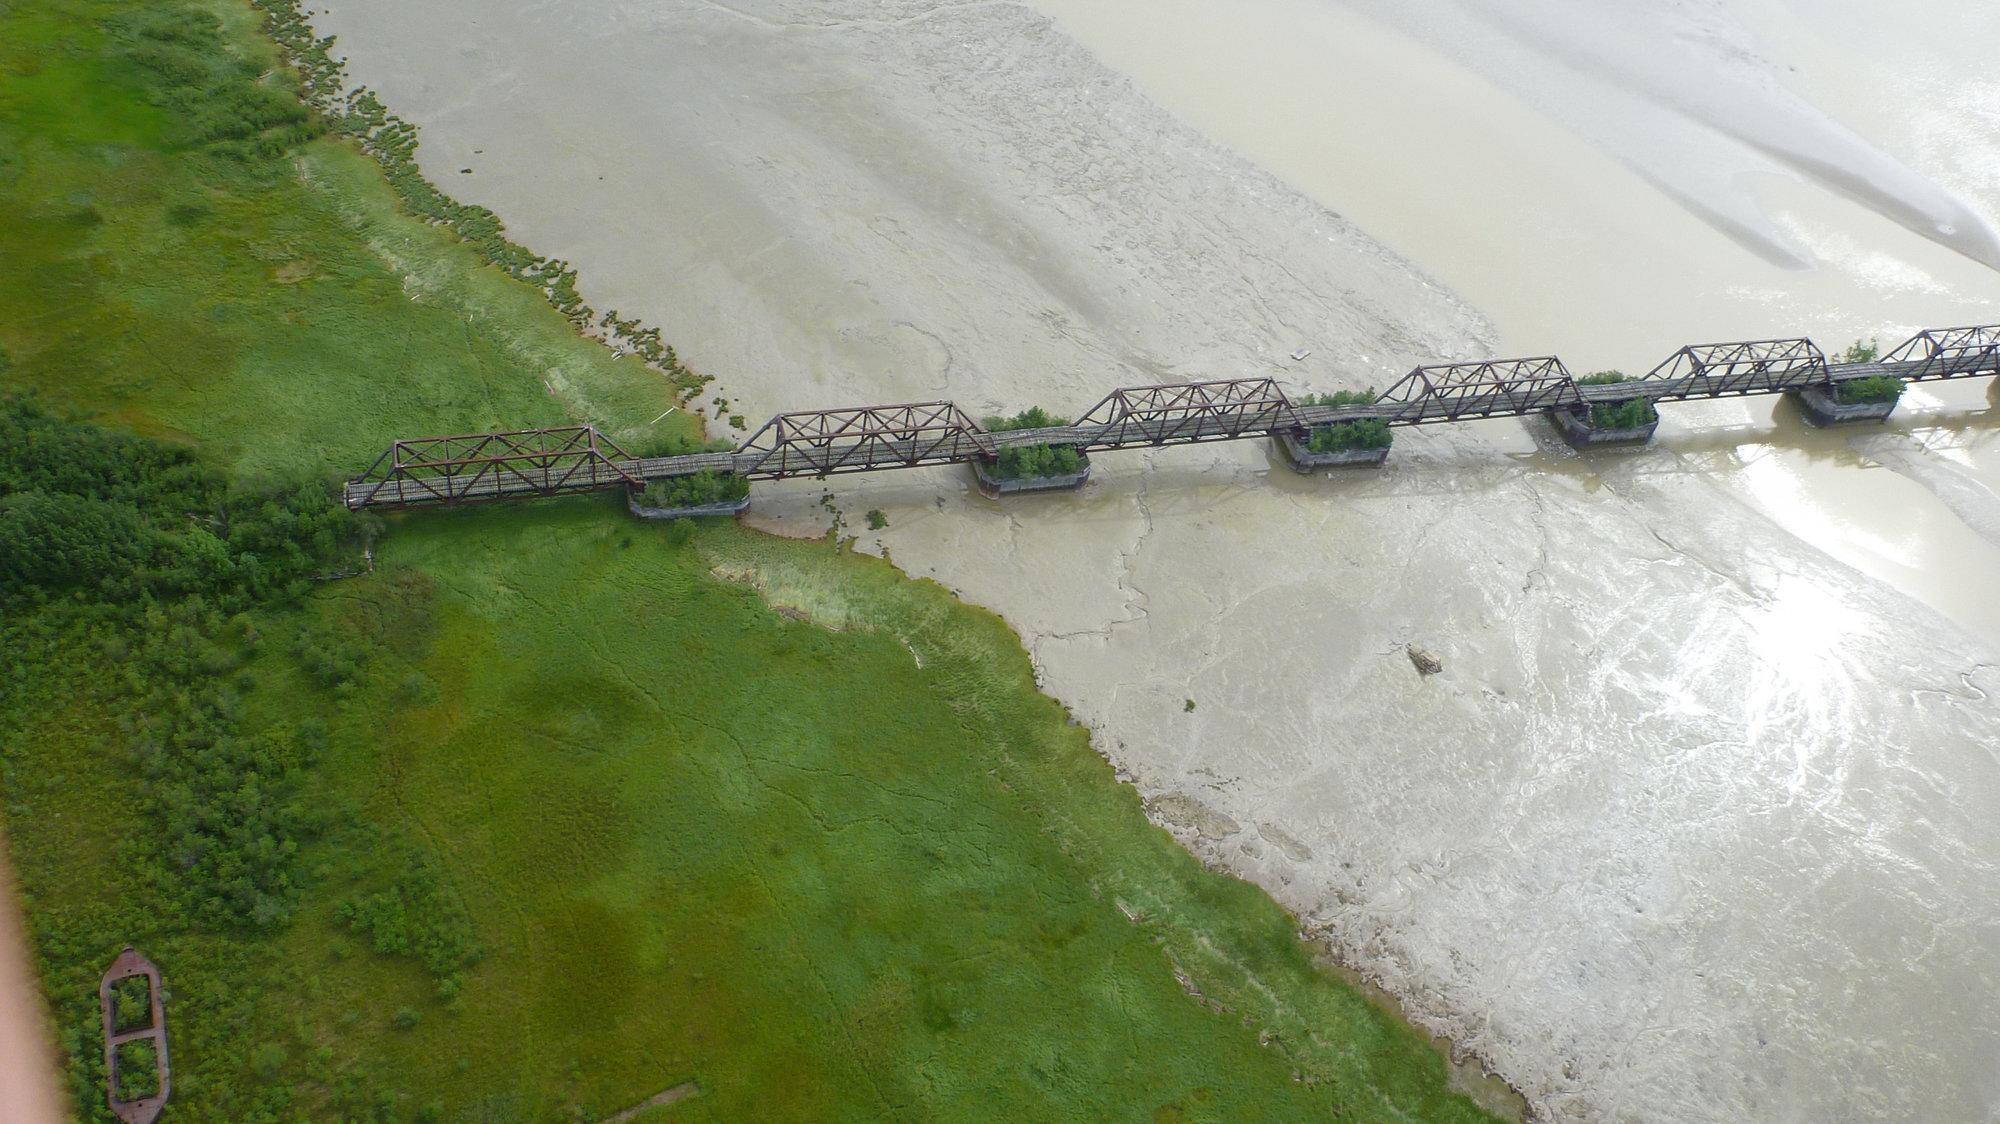 2560px-Port_Nelson_-_Bridge_Shoreline_-_MB_Hydro_Collection.jpeg